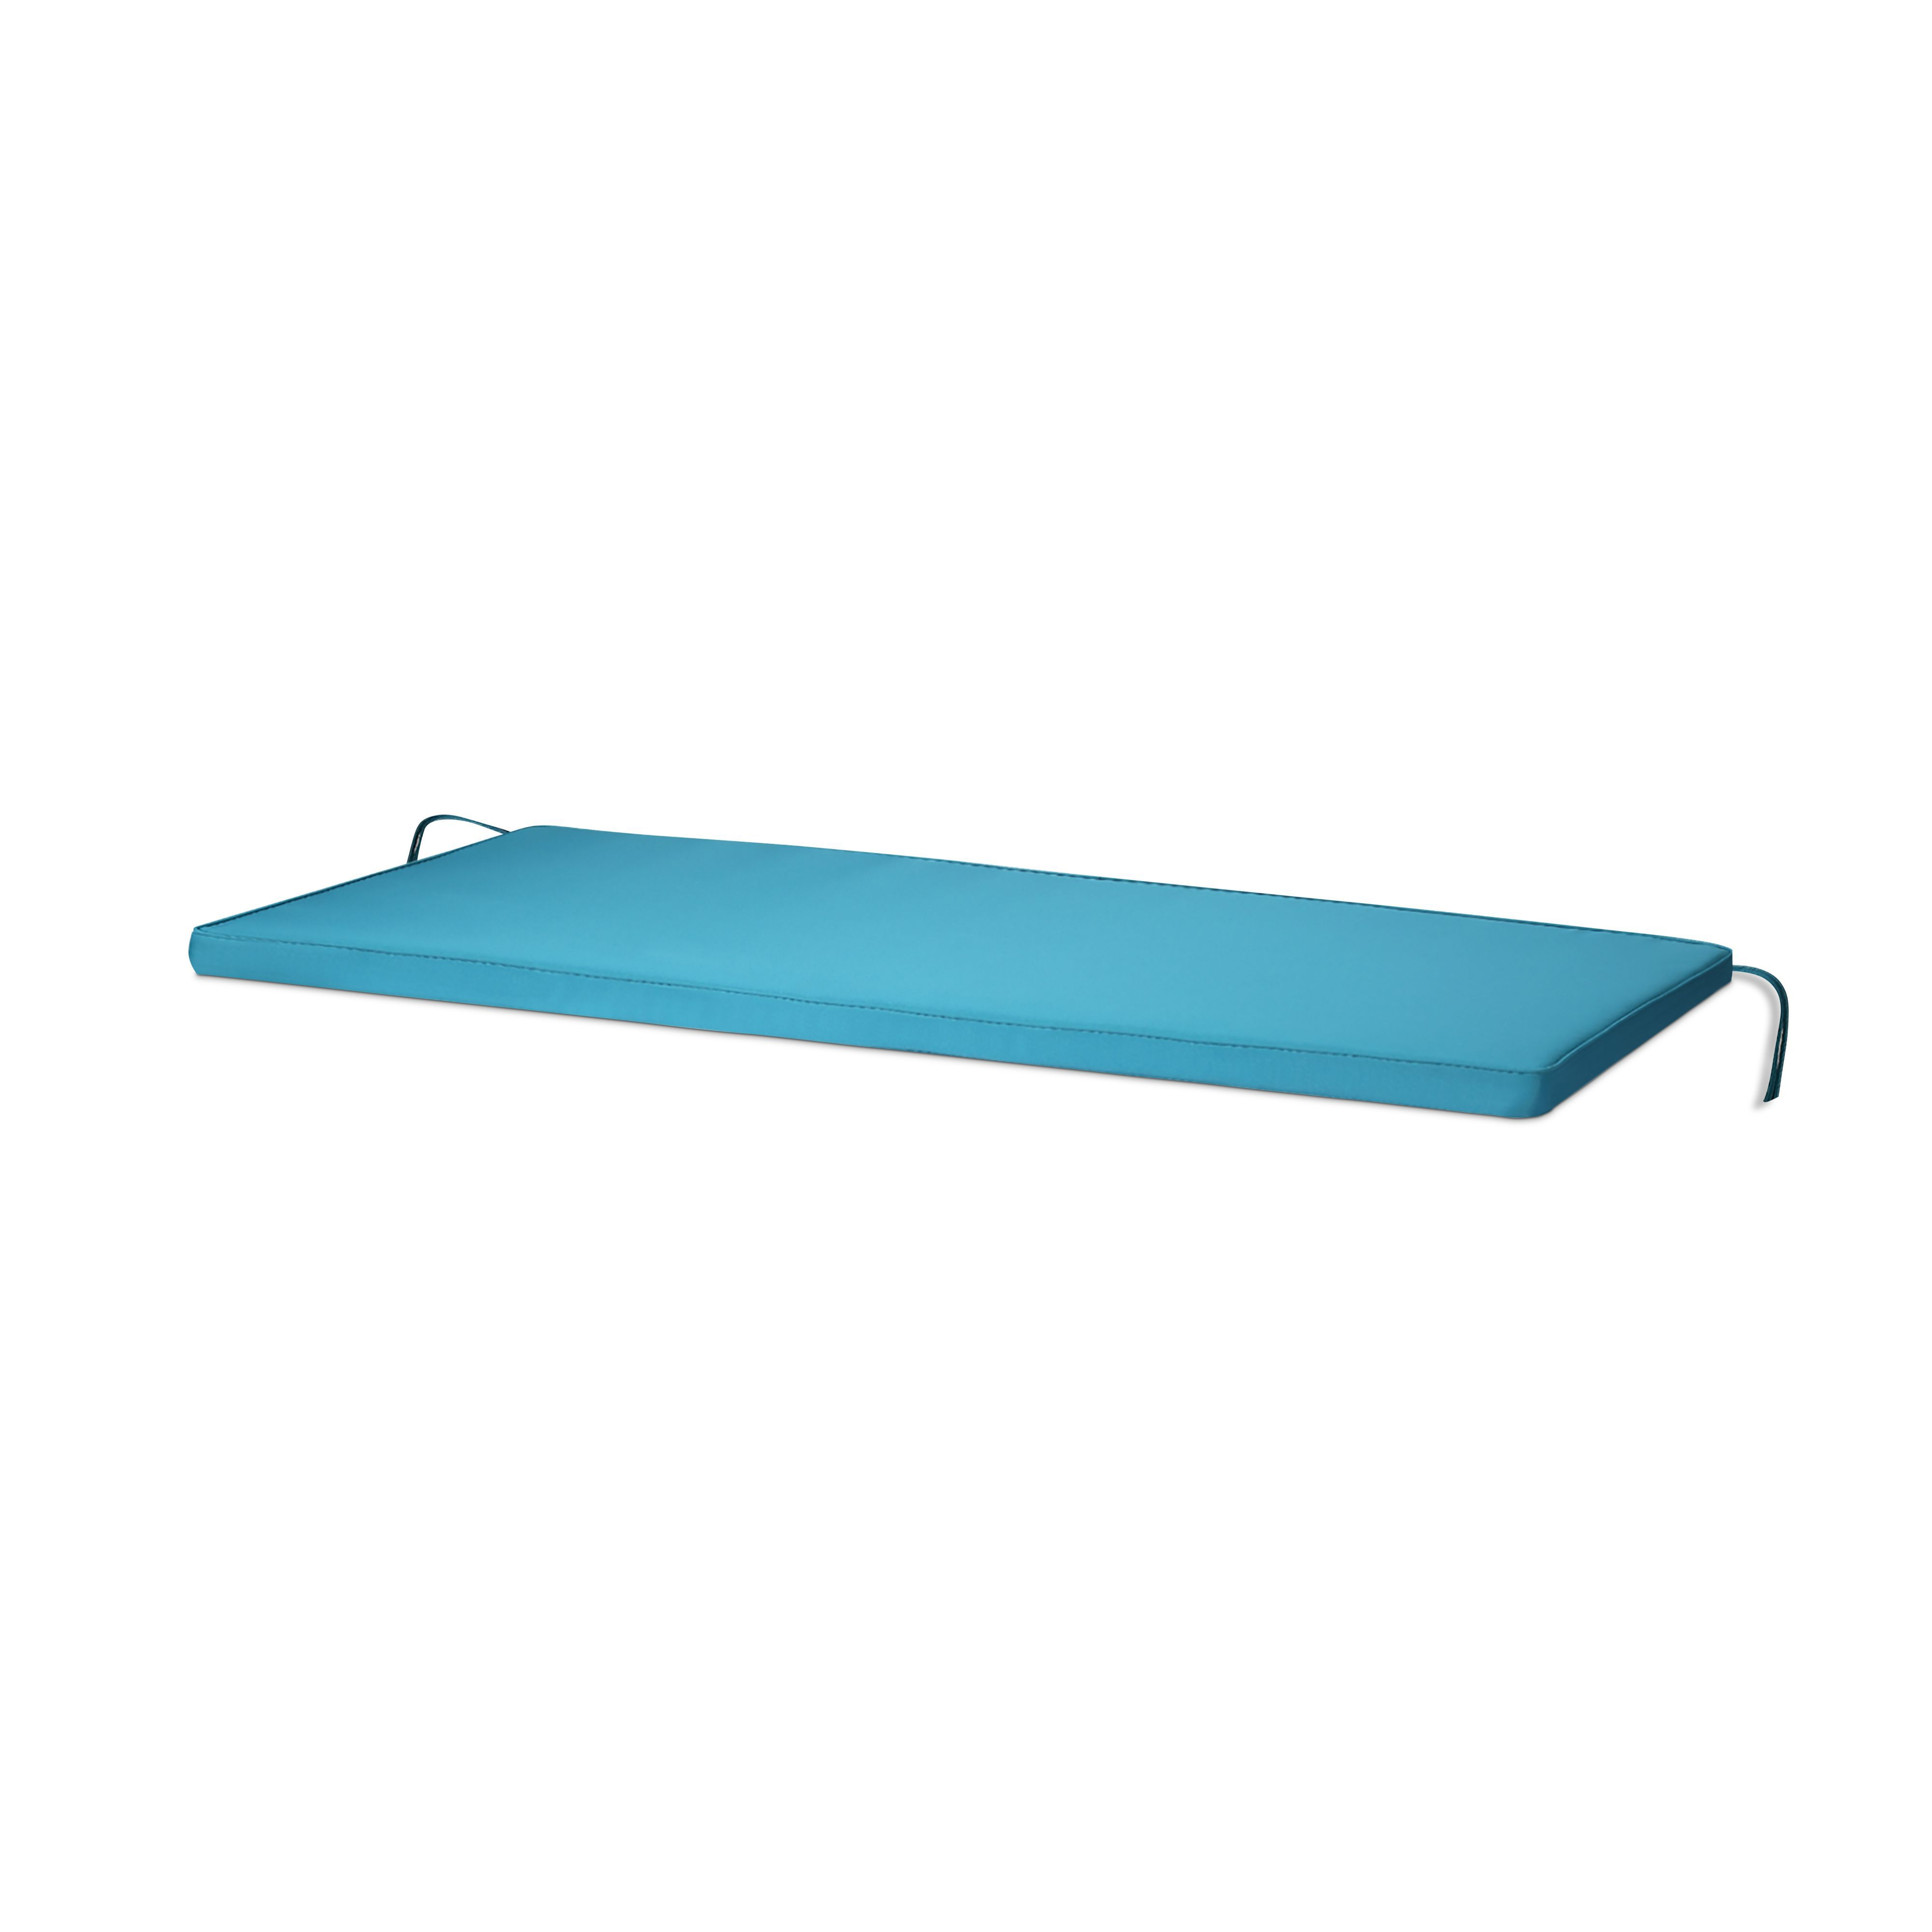 Tiga Biscay Blue Plain Bench Cushion